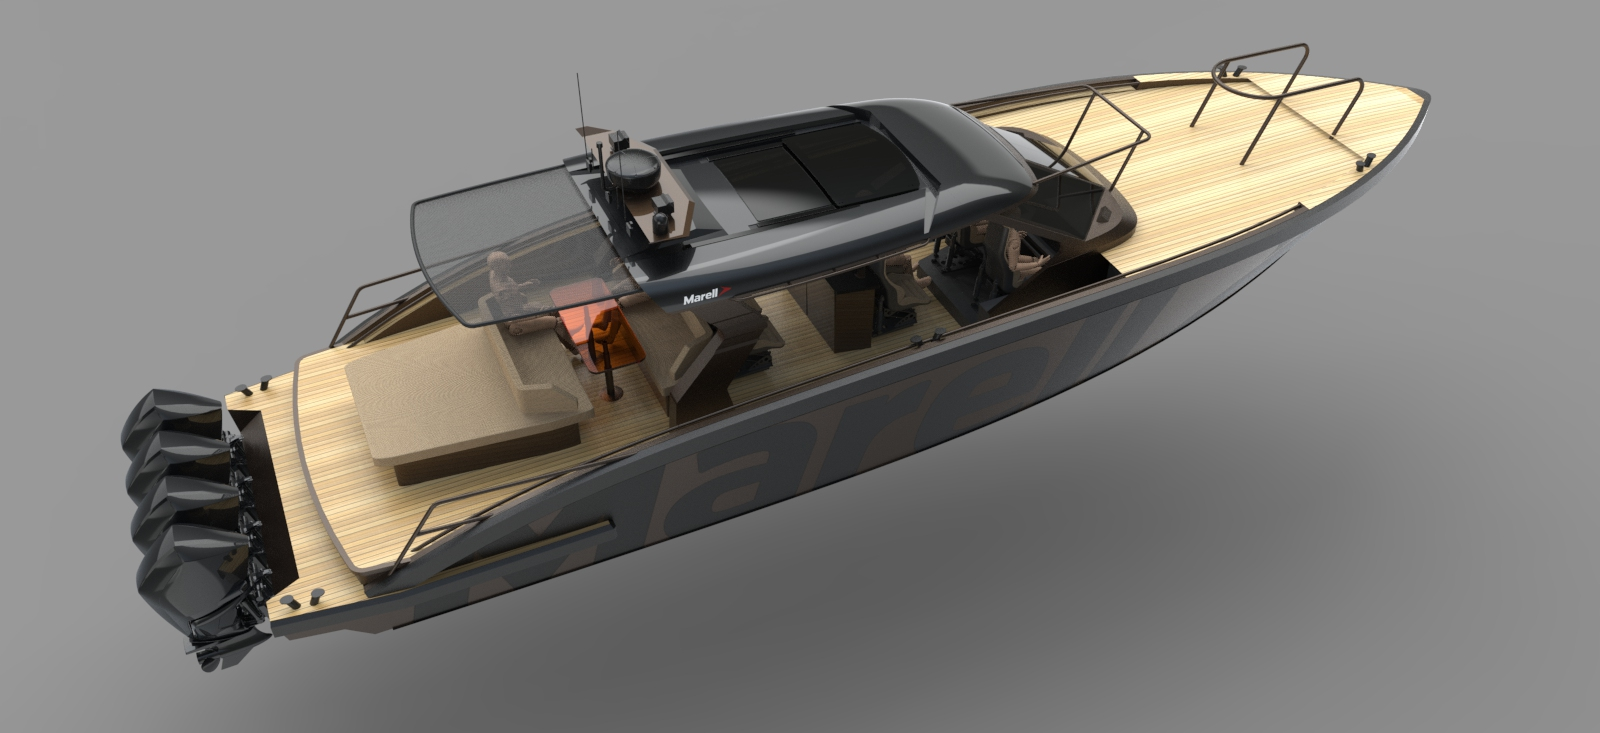 m15 rendered model